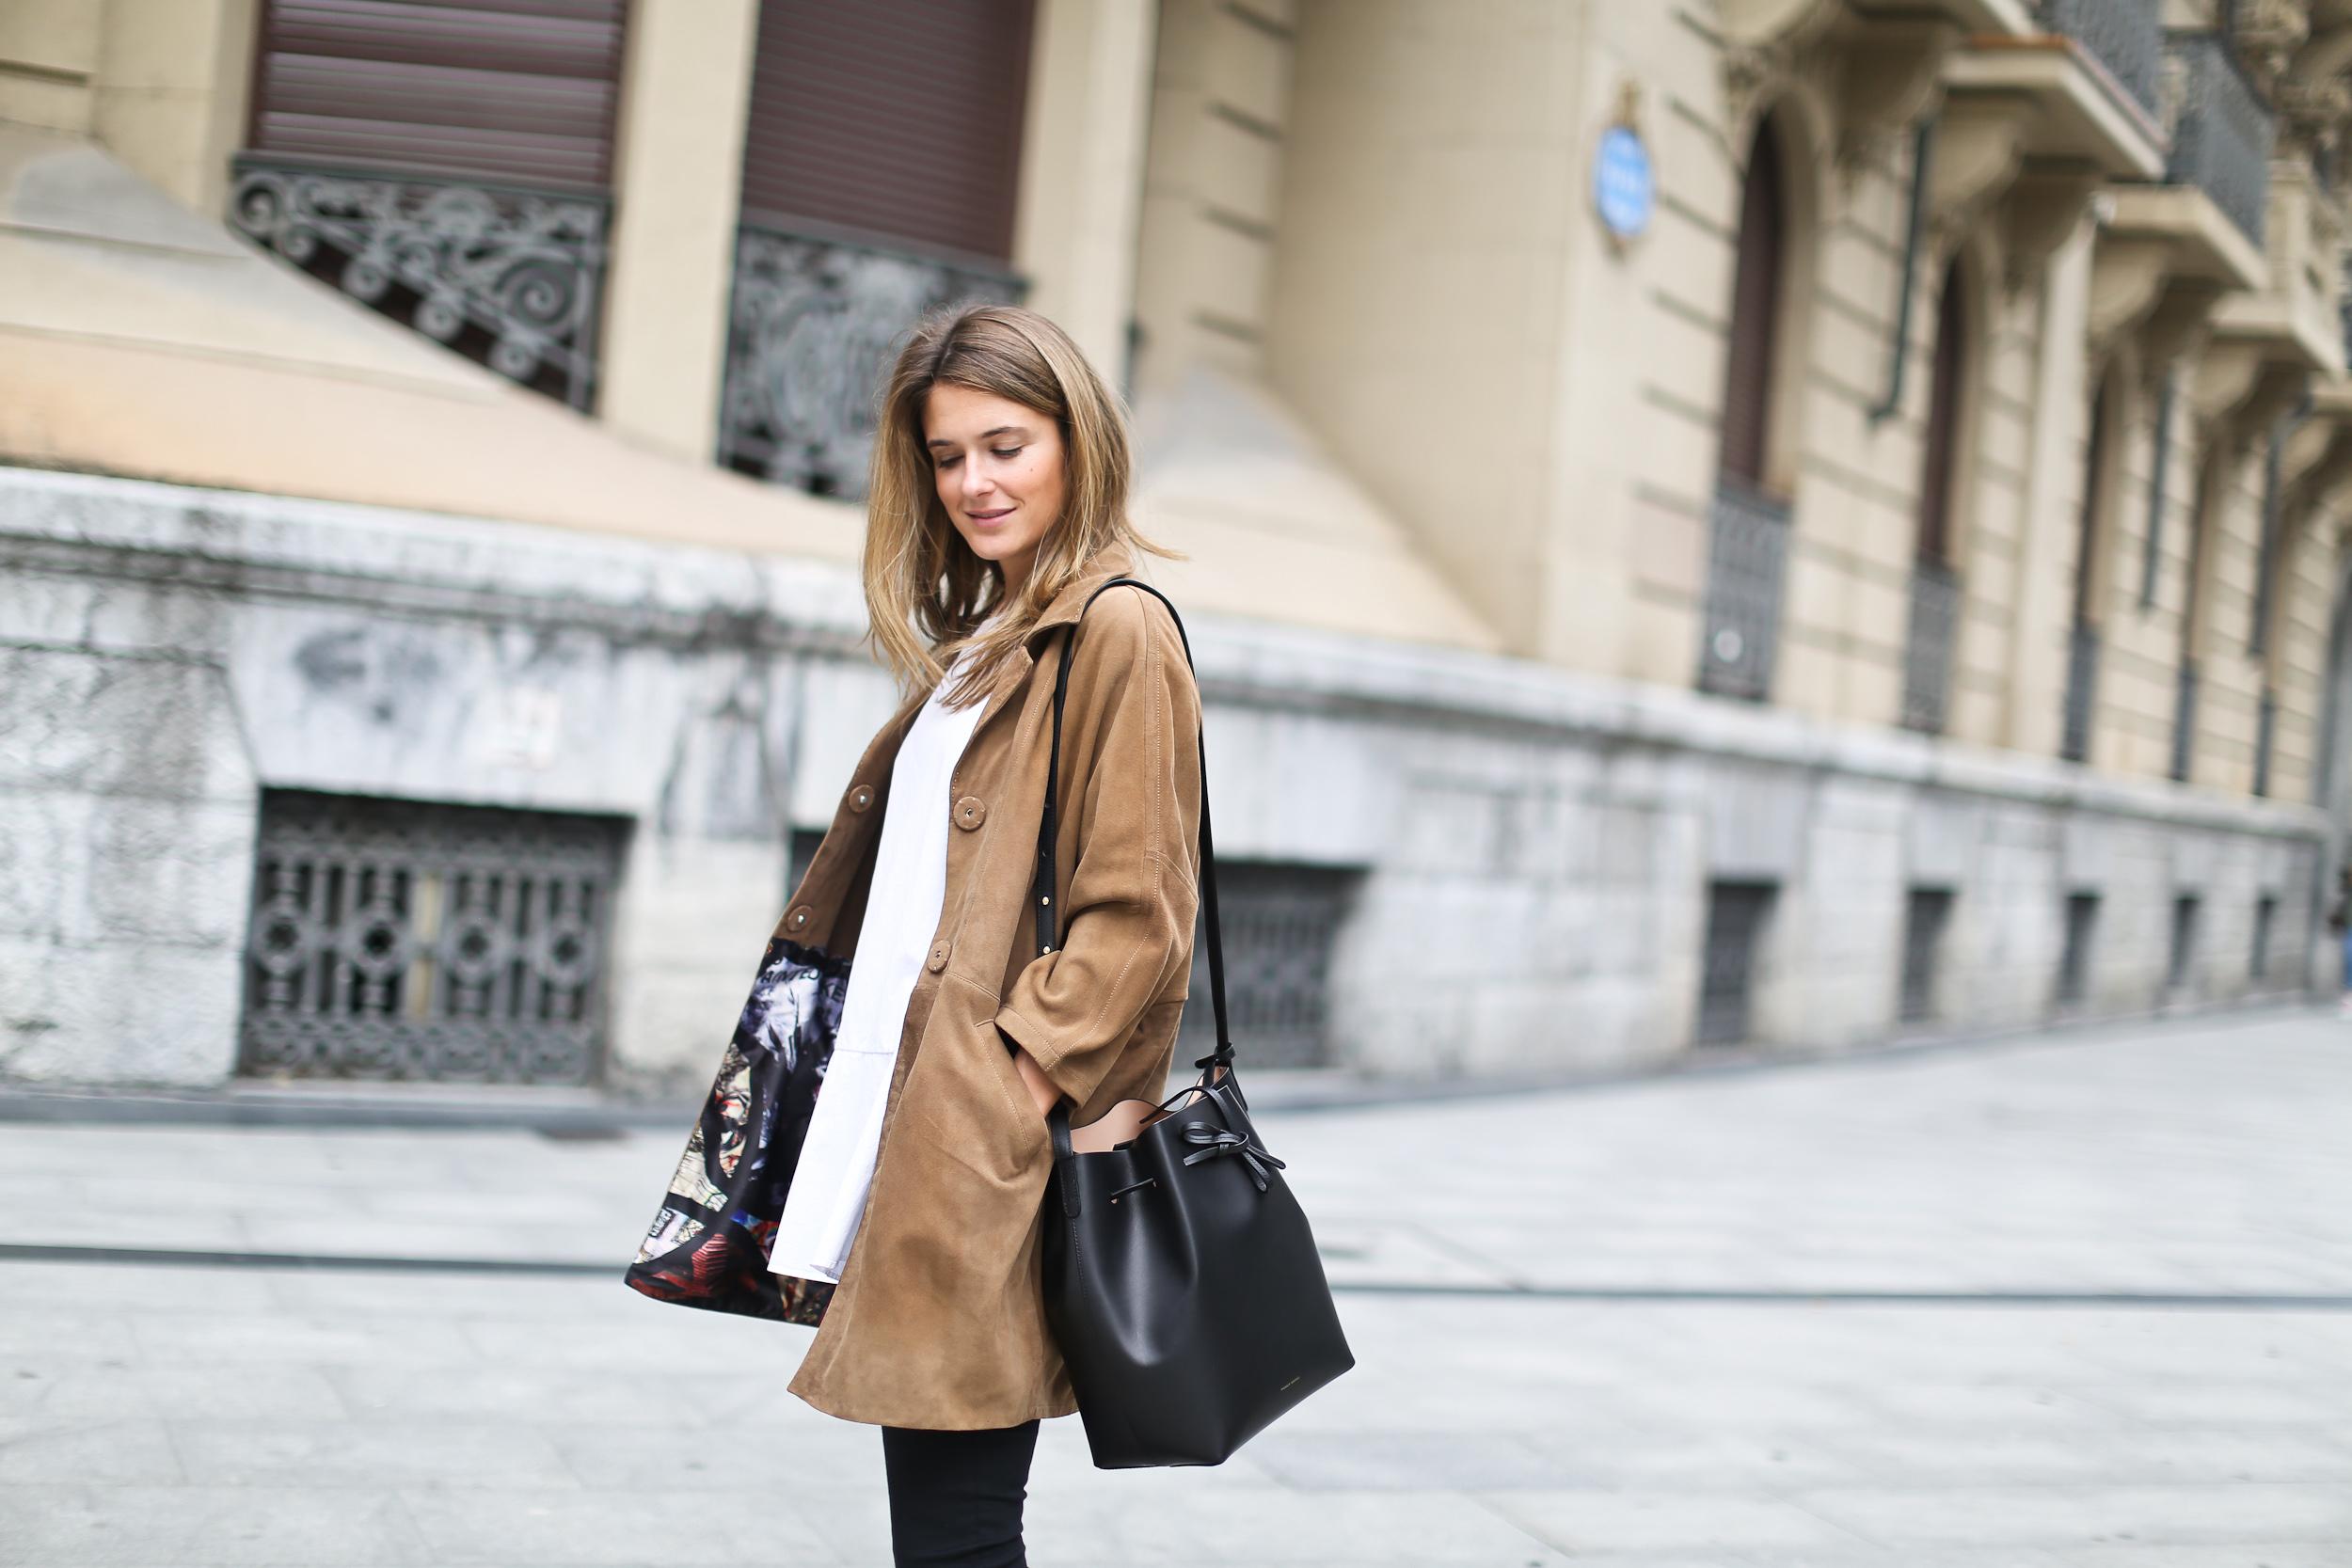 Clochet_streetstyle_boxcalf_chaqueta_ante_platform_brogues_masur_gavriel_bucket_bag-9